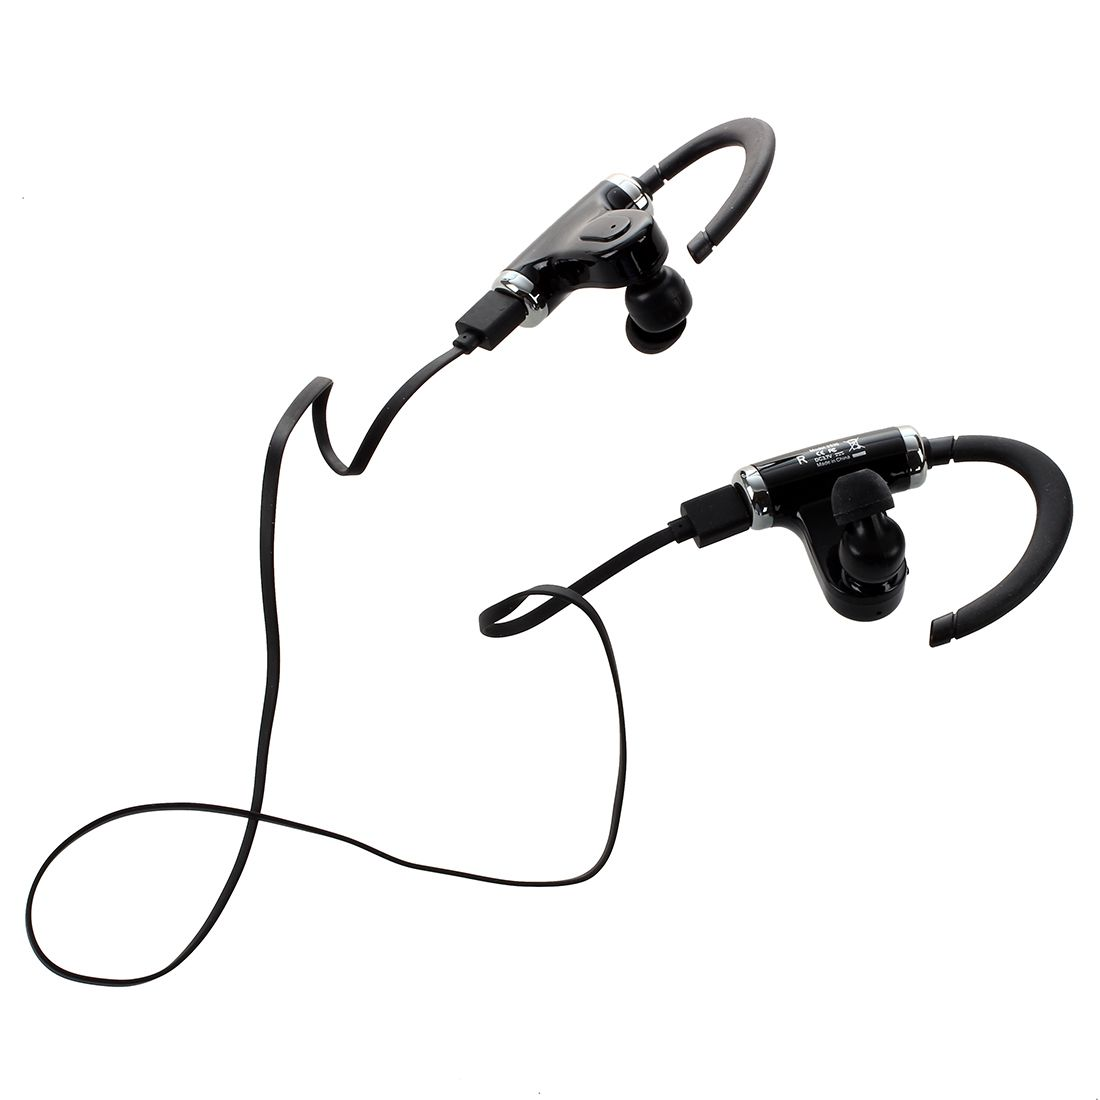 Roman Super Bass Handsfree Sport Wireless Bluetooth Headset Earphone Headphone Earbud Fone de ouvido sem fio with Mic Microphone